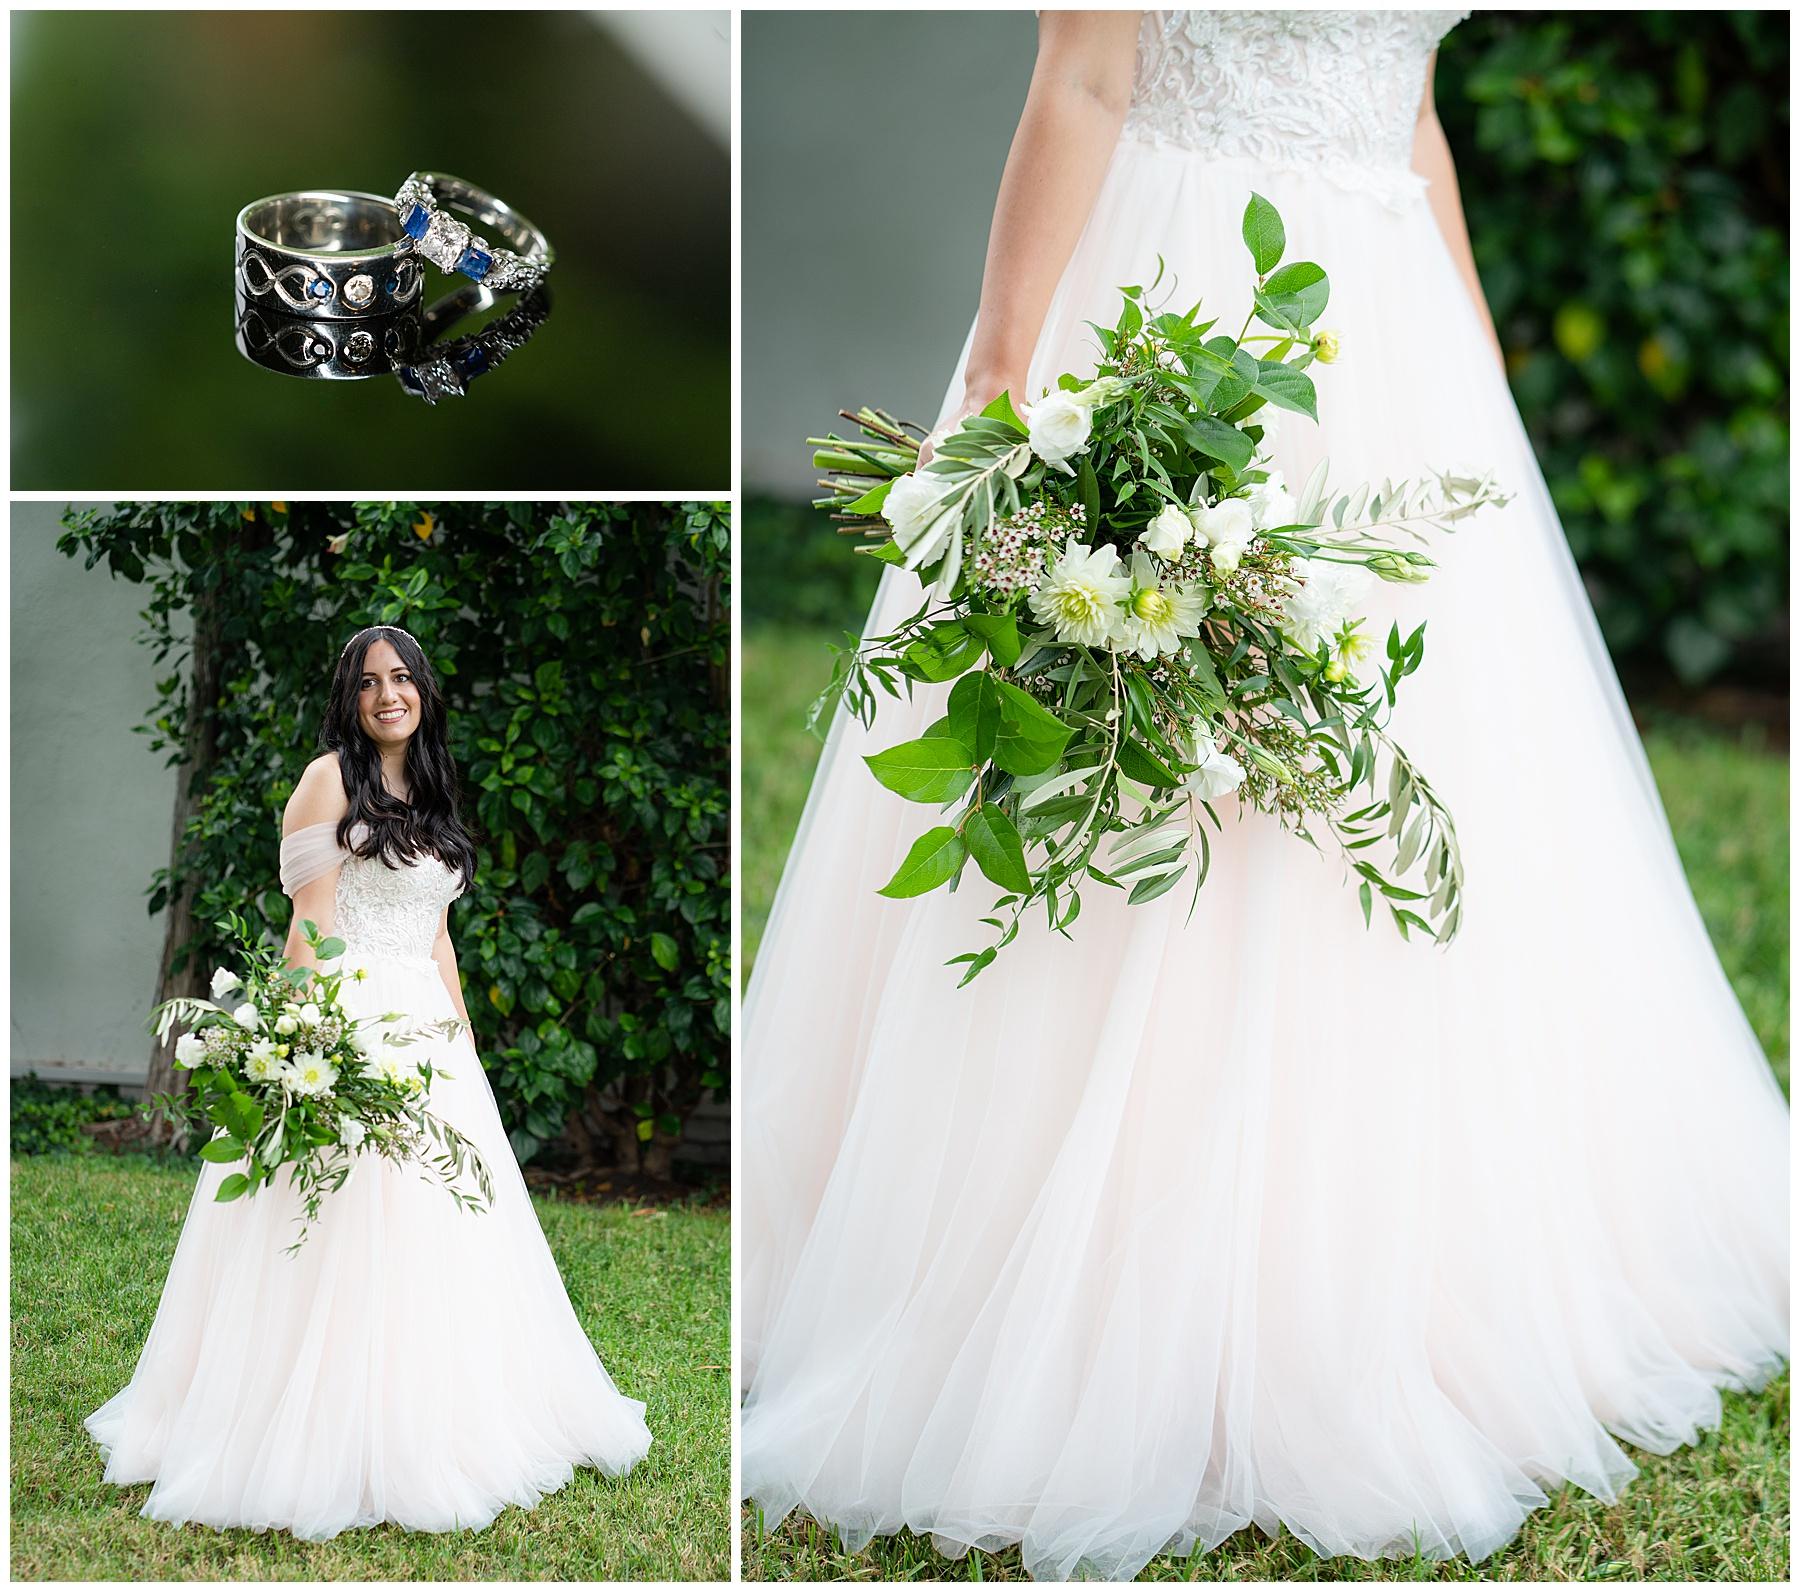 blue diamond ring and wedding dress